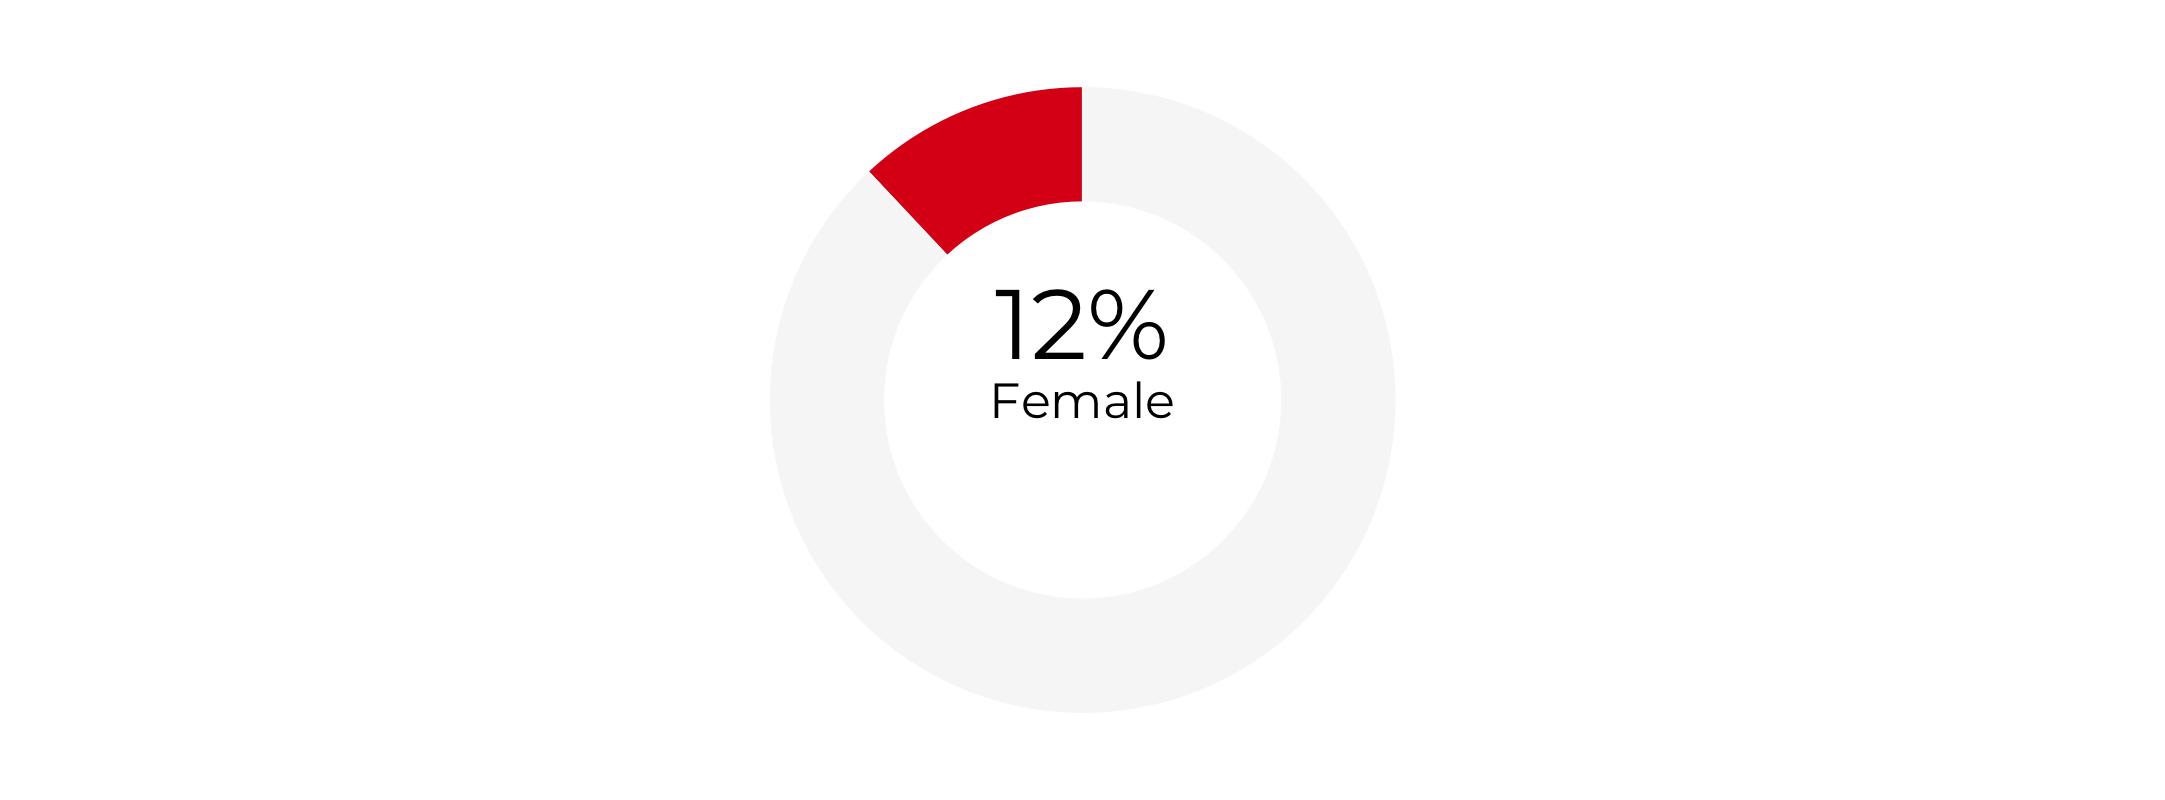 Graph about Gender Composition of Secretaries of Housing and Urban Development. More detailed text description below.